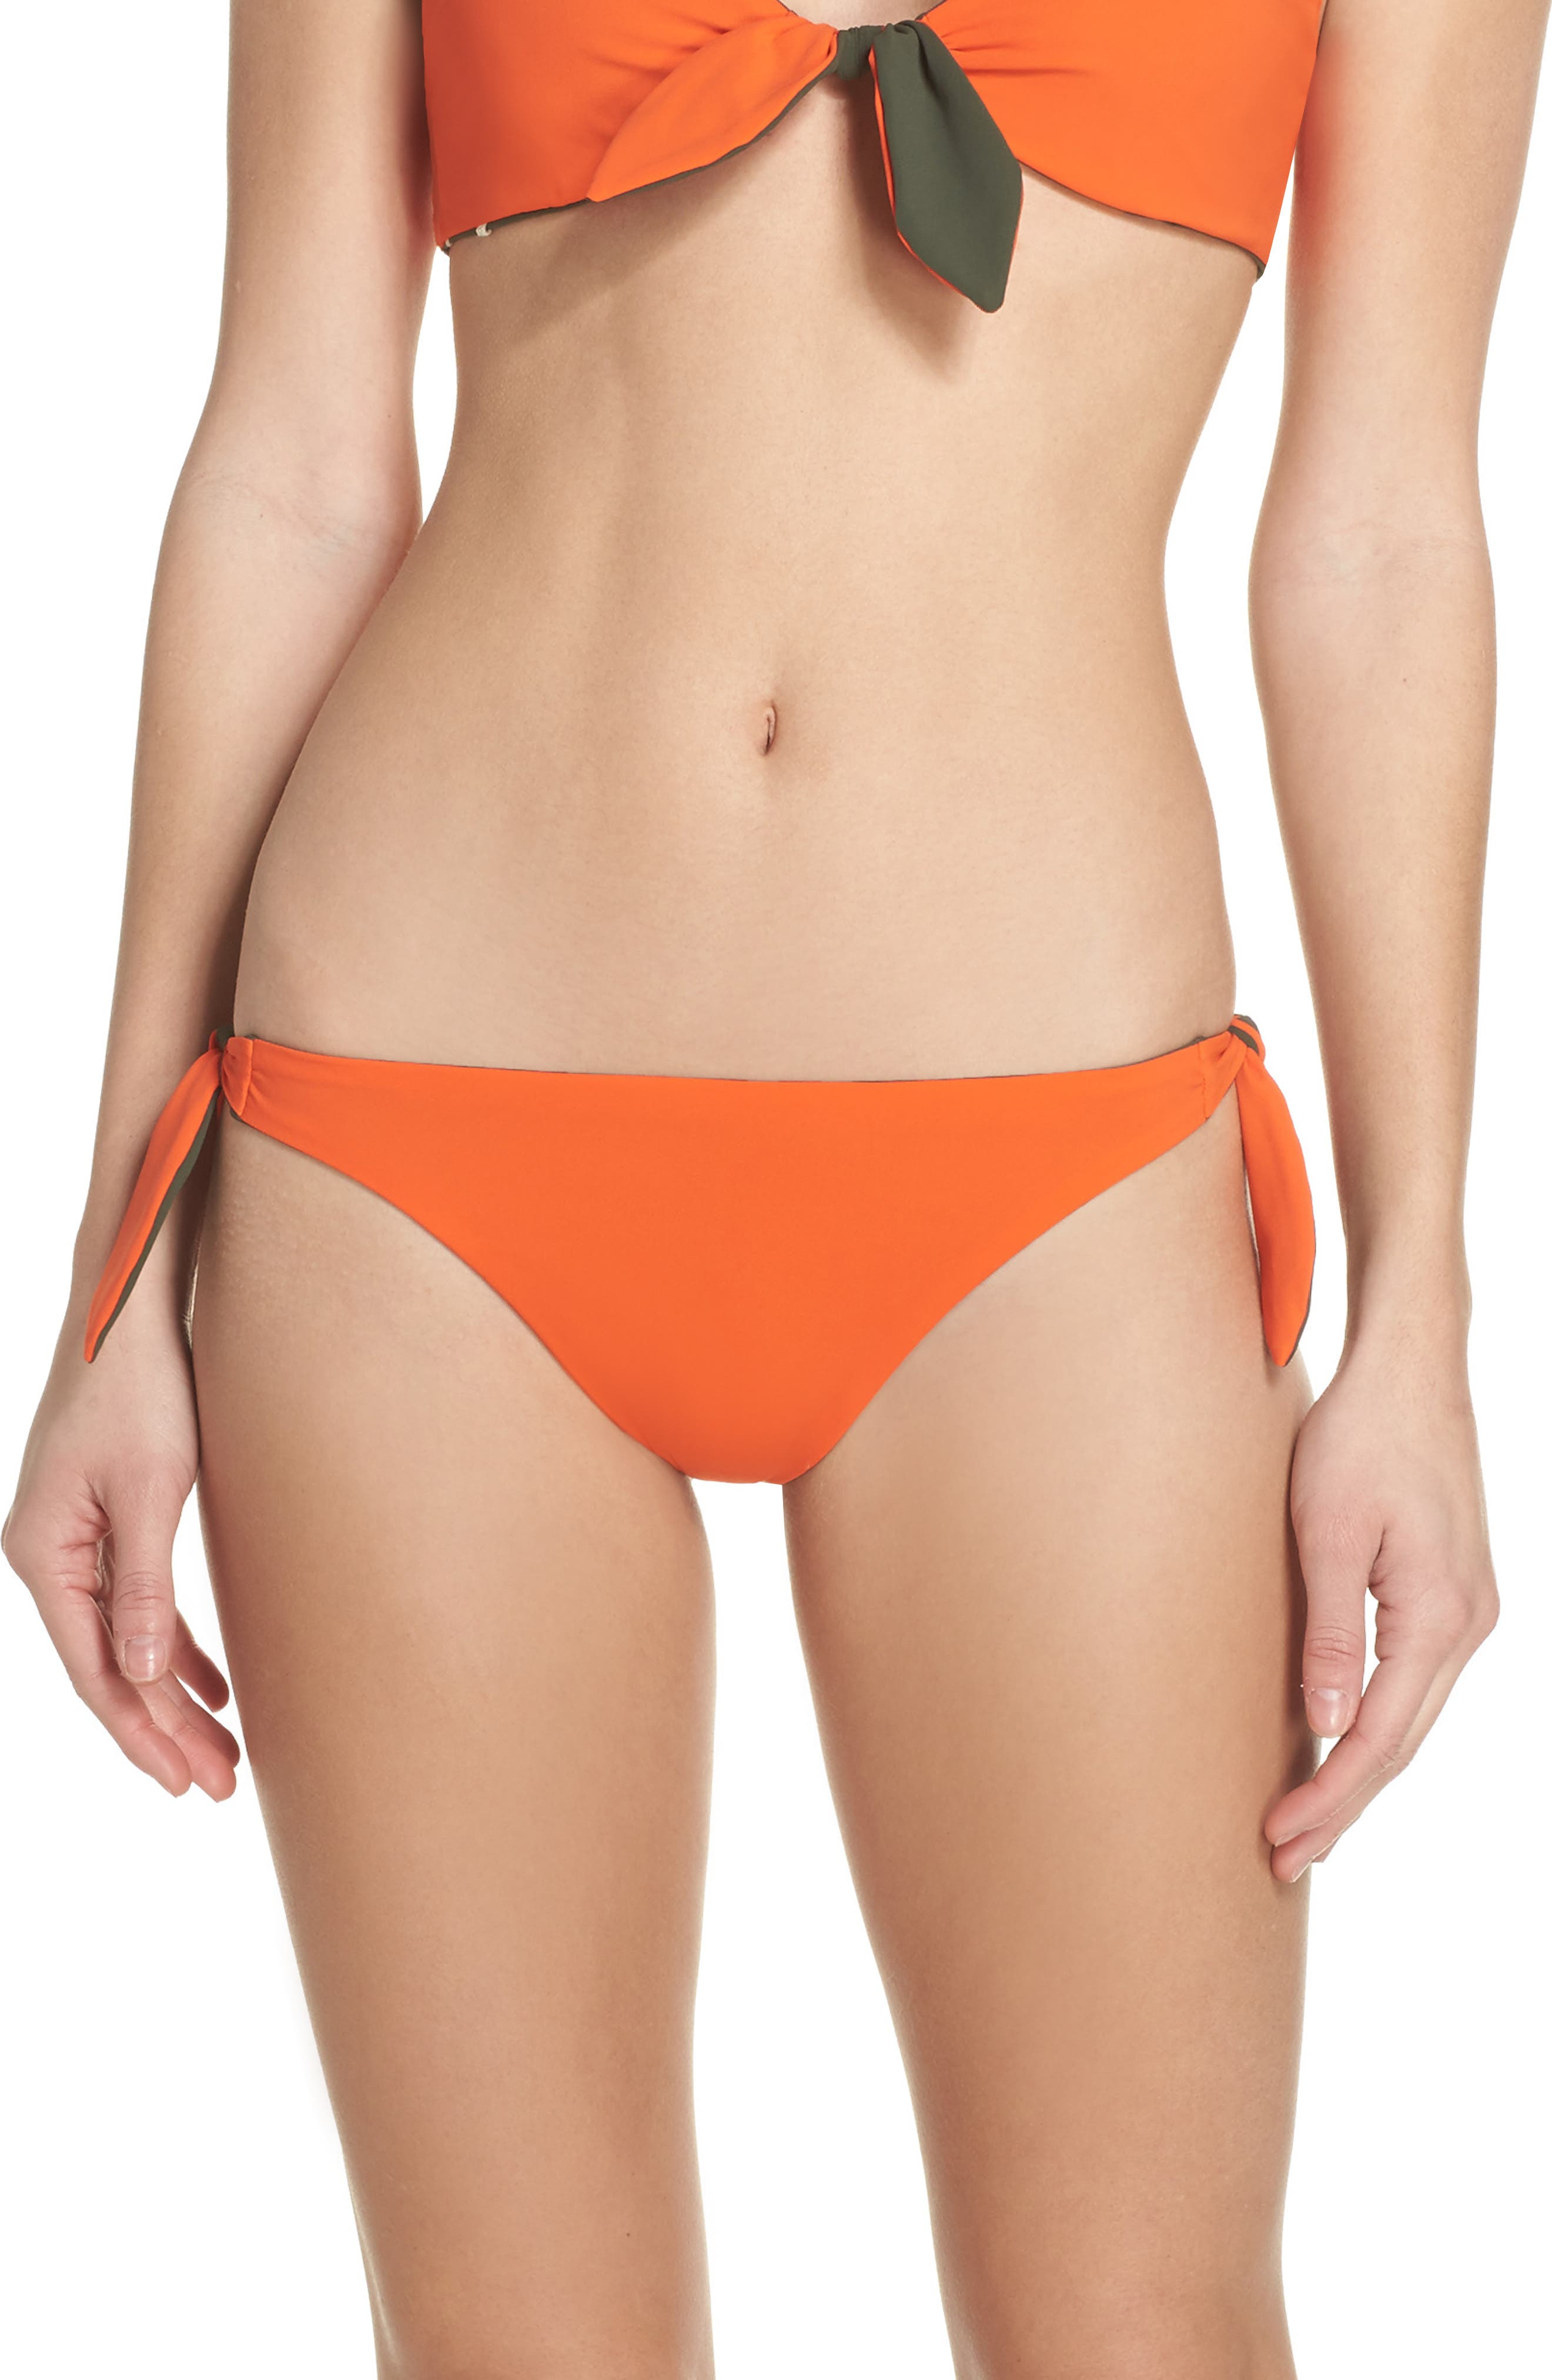 Biarritz Reversible Bikini Bottoms,                             Alternate thumbnail 2, color,                             Green Olive/ Sweet Tangerine